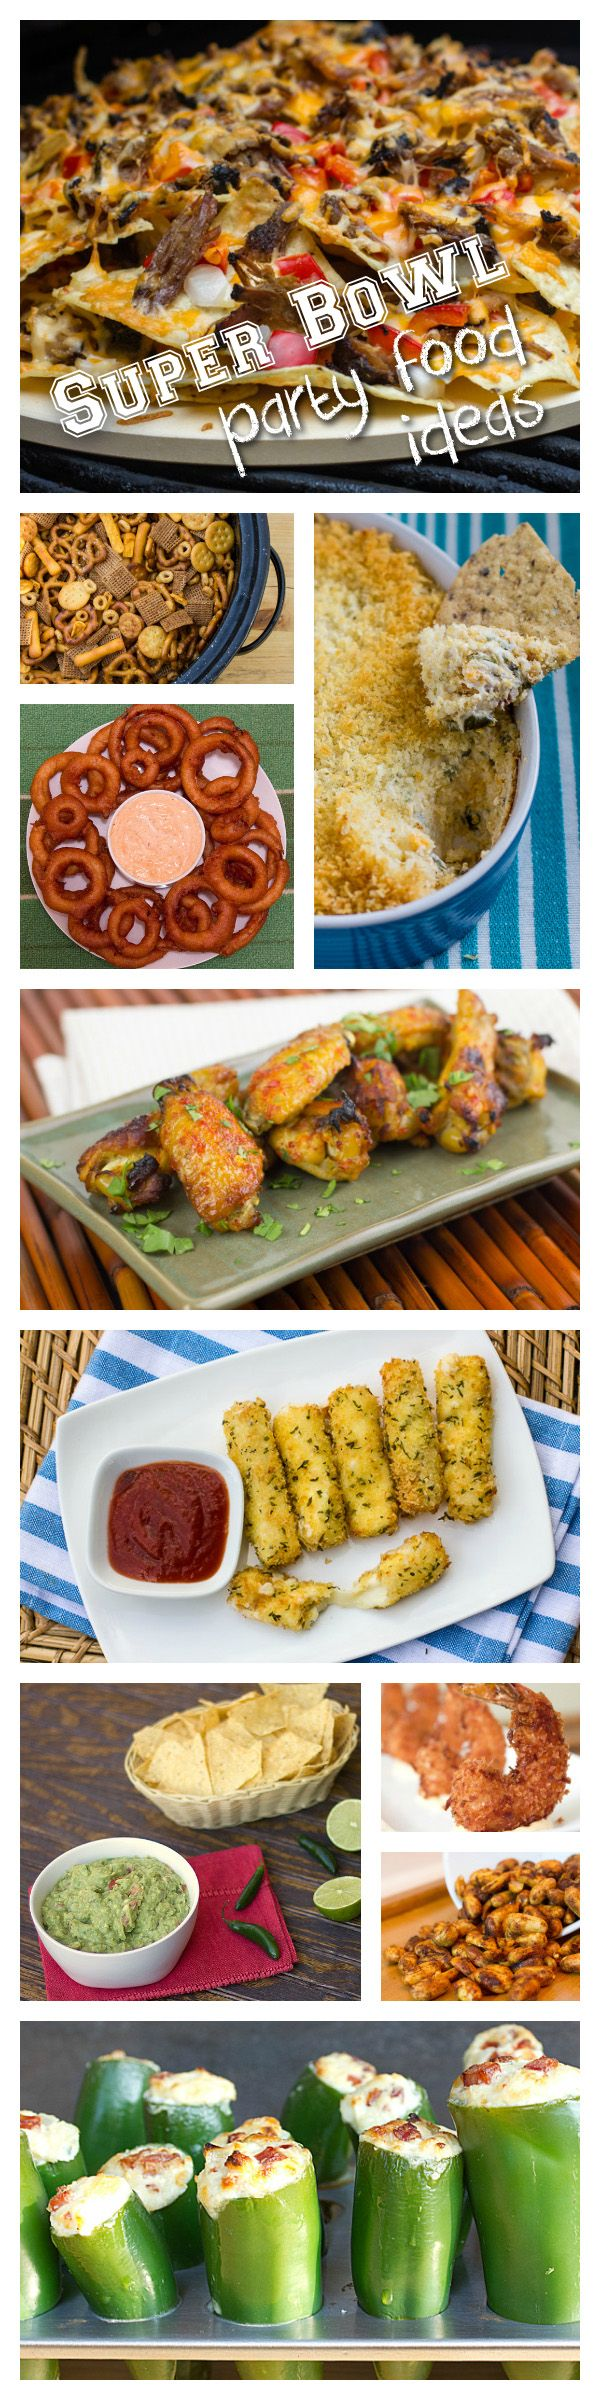 Super Bowl Party Food Ideas